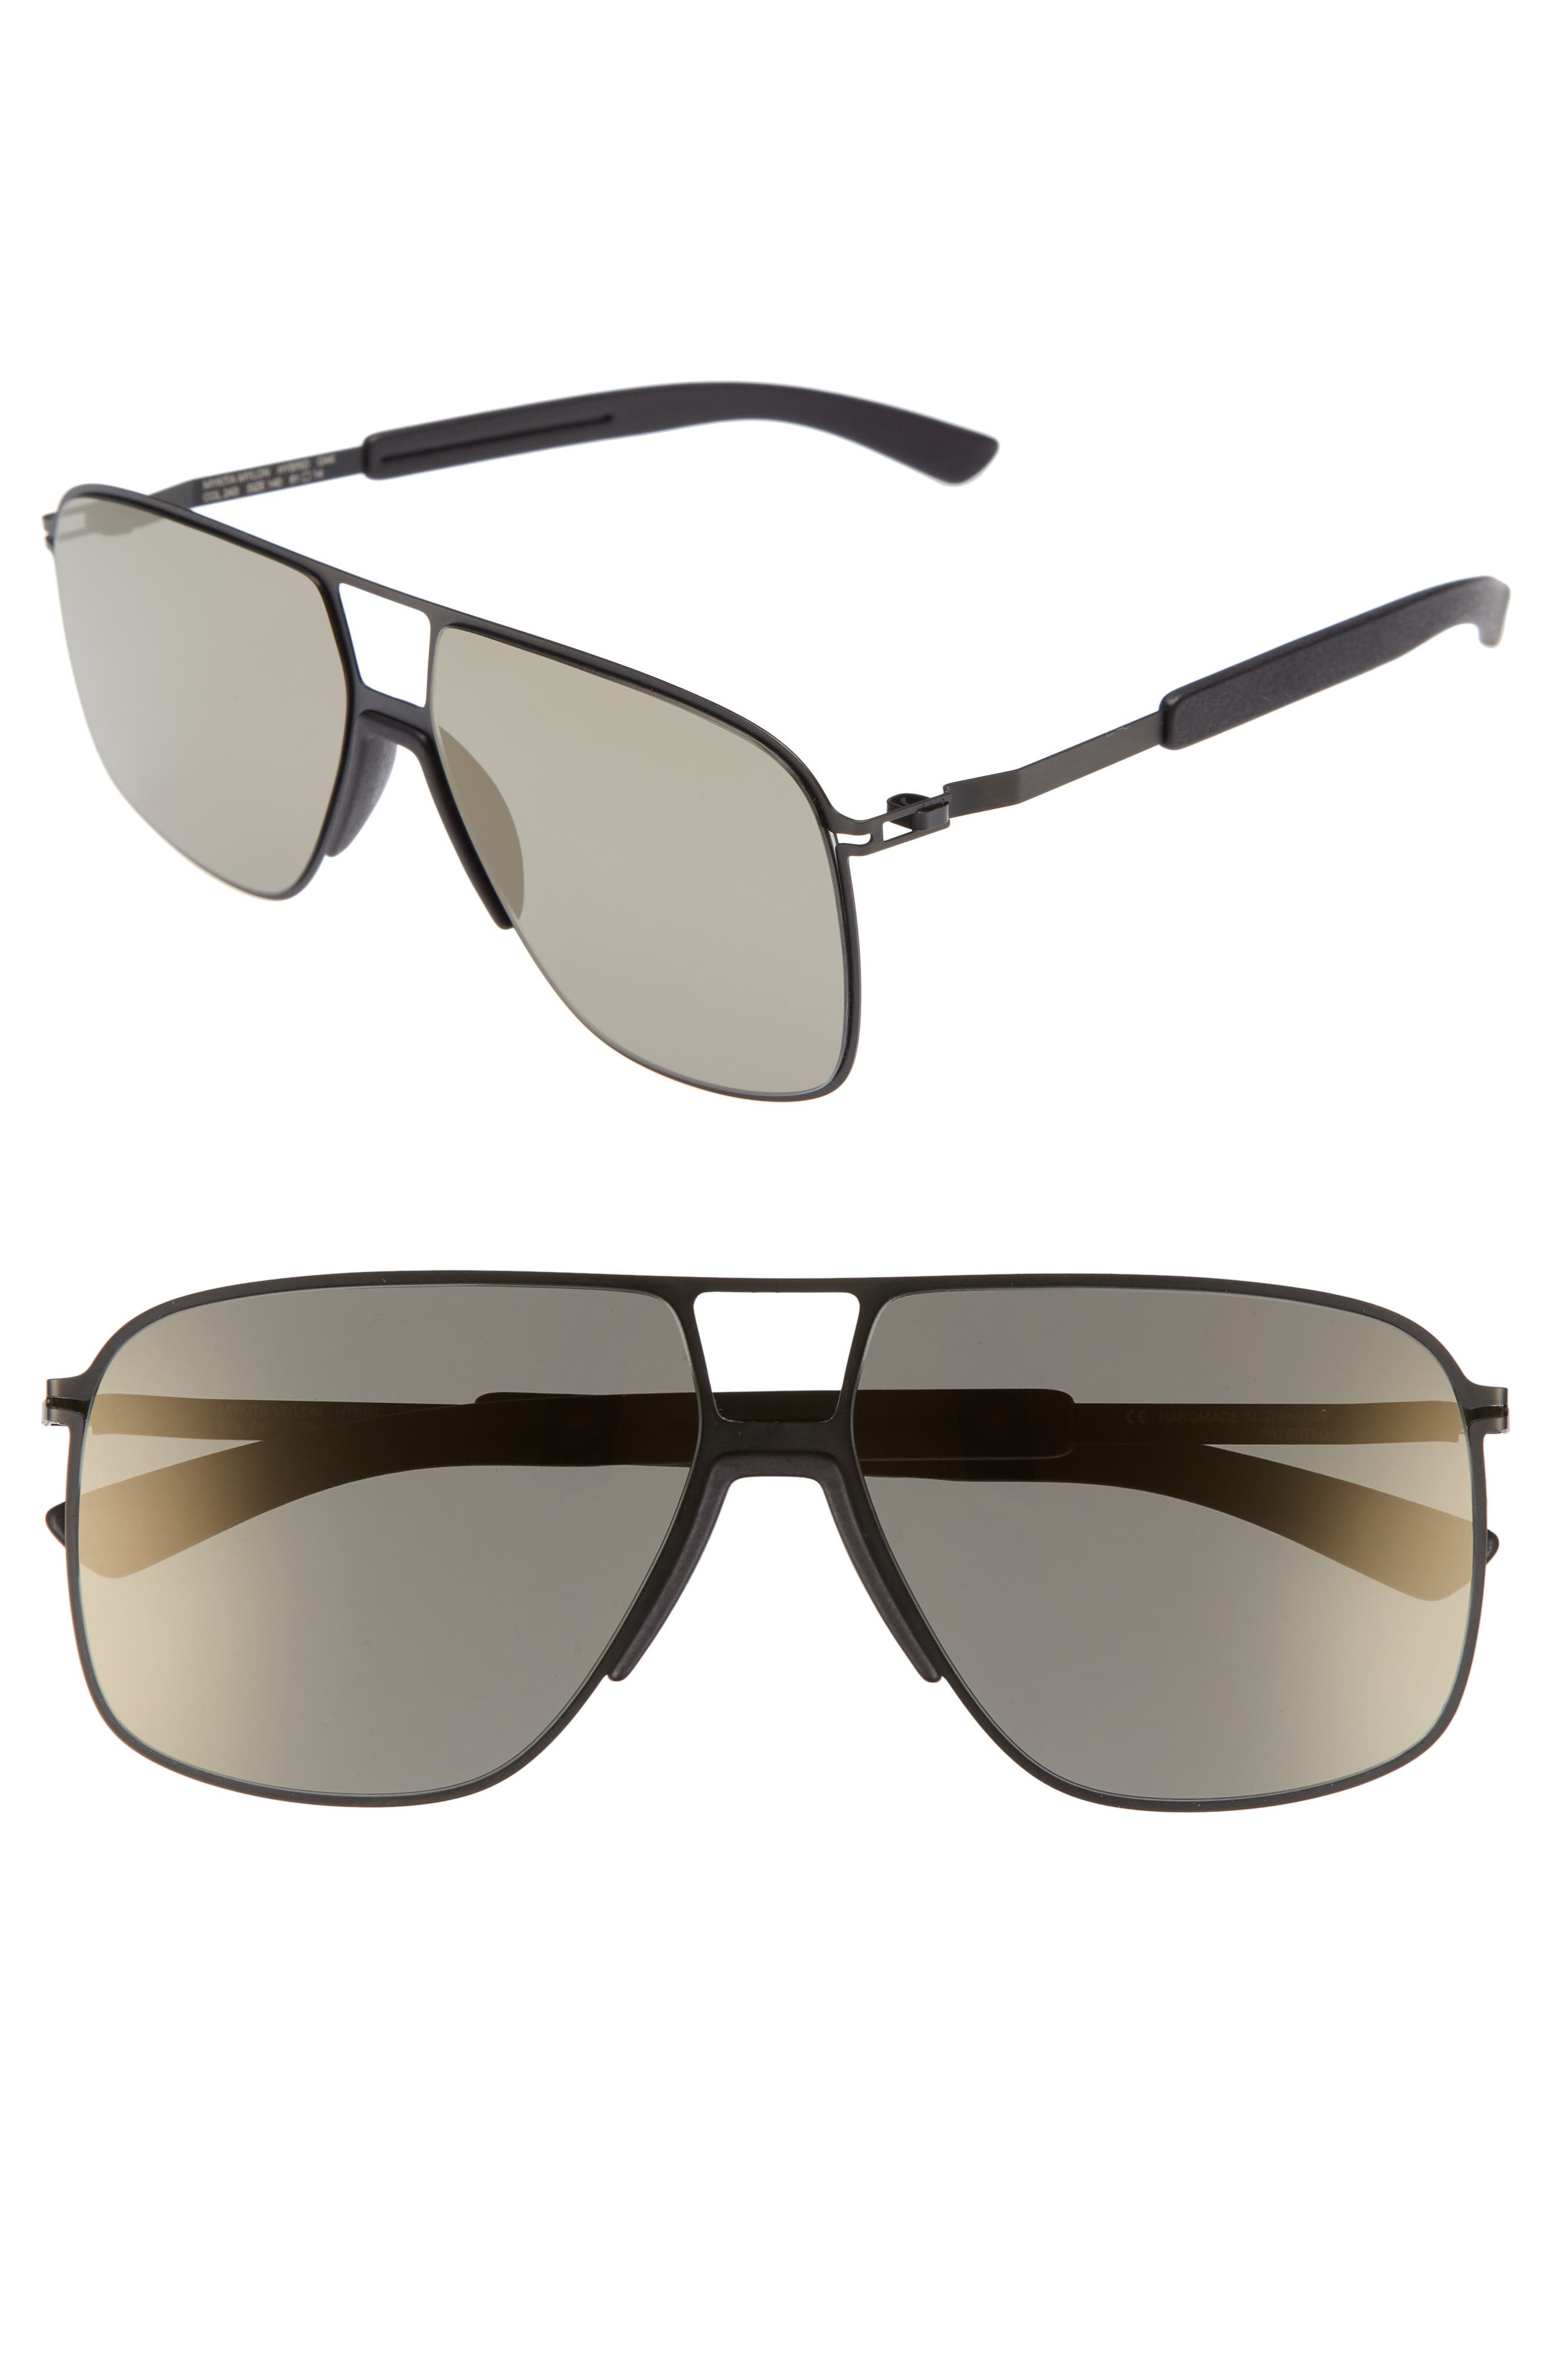 Oak 61mm Aviator Sunglasses,                             Main thumbnail 1, color,